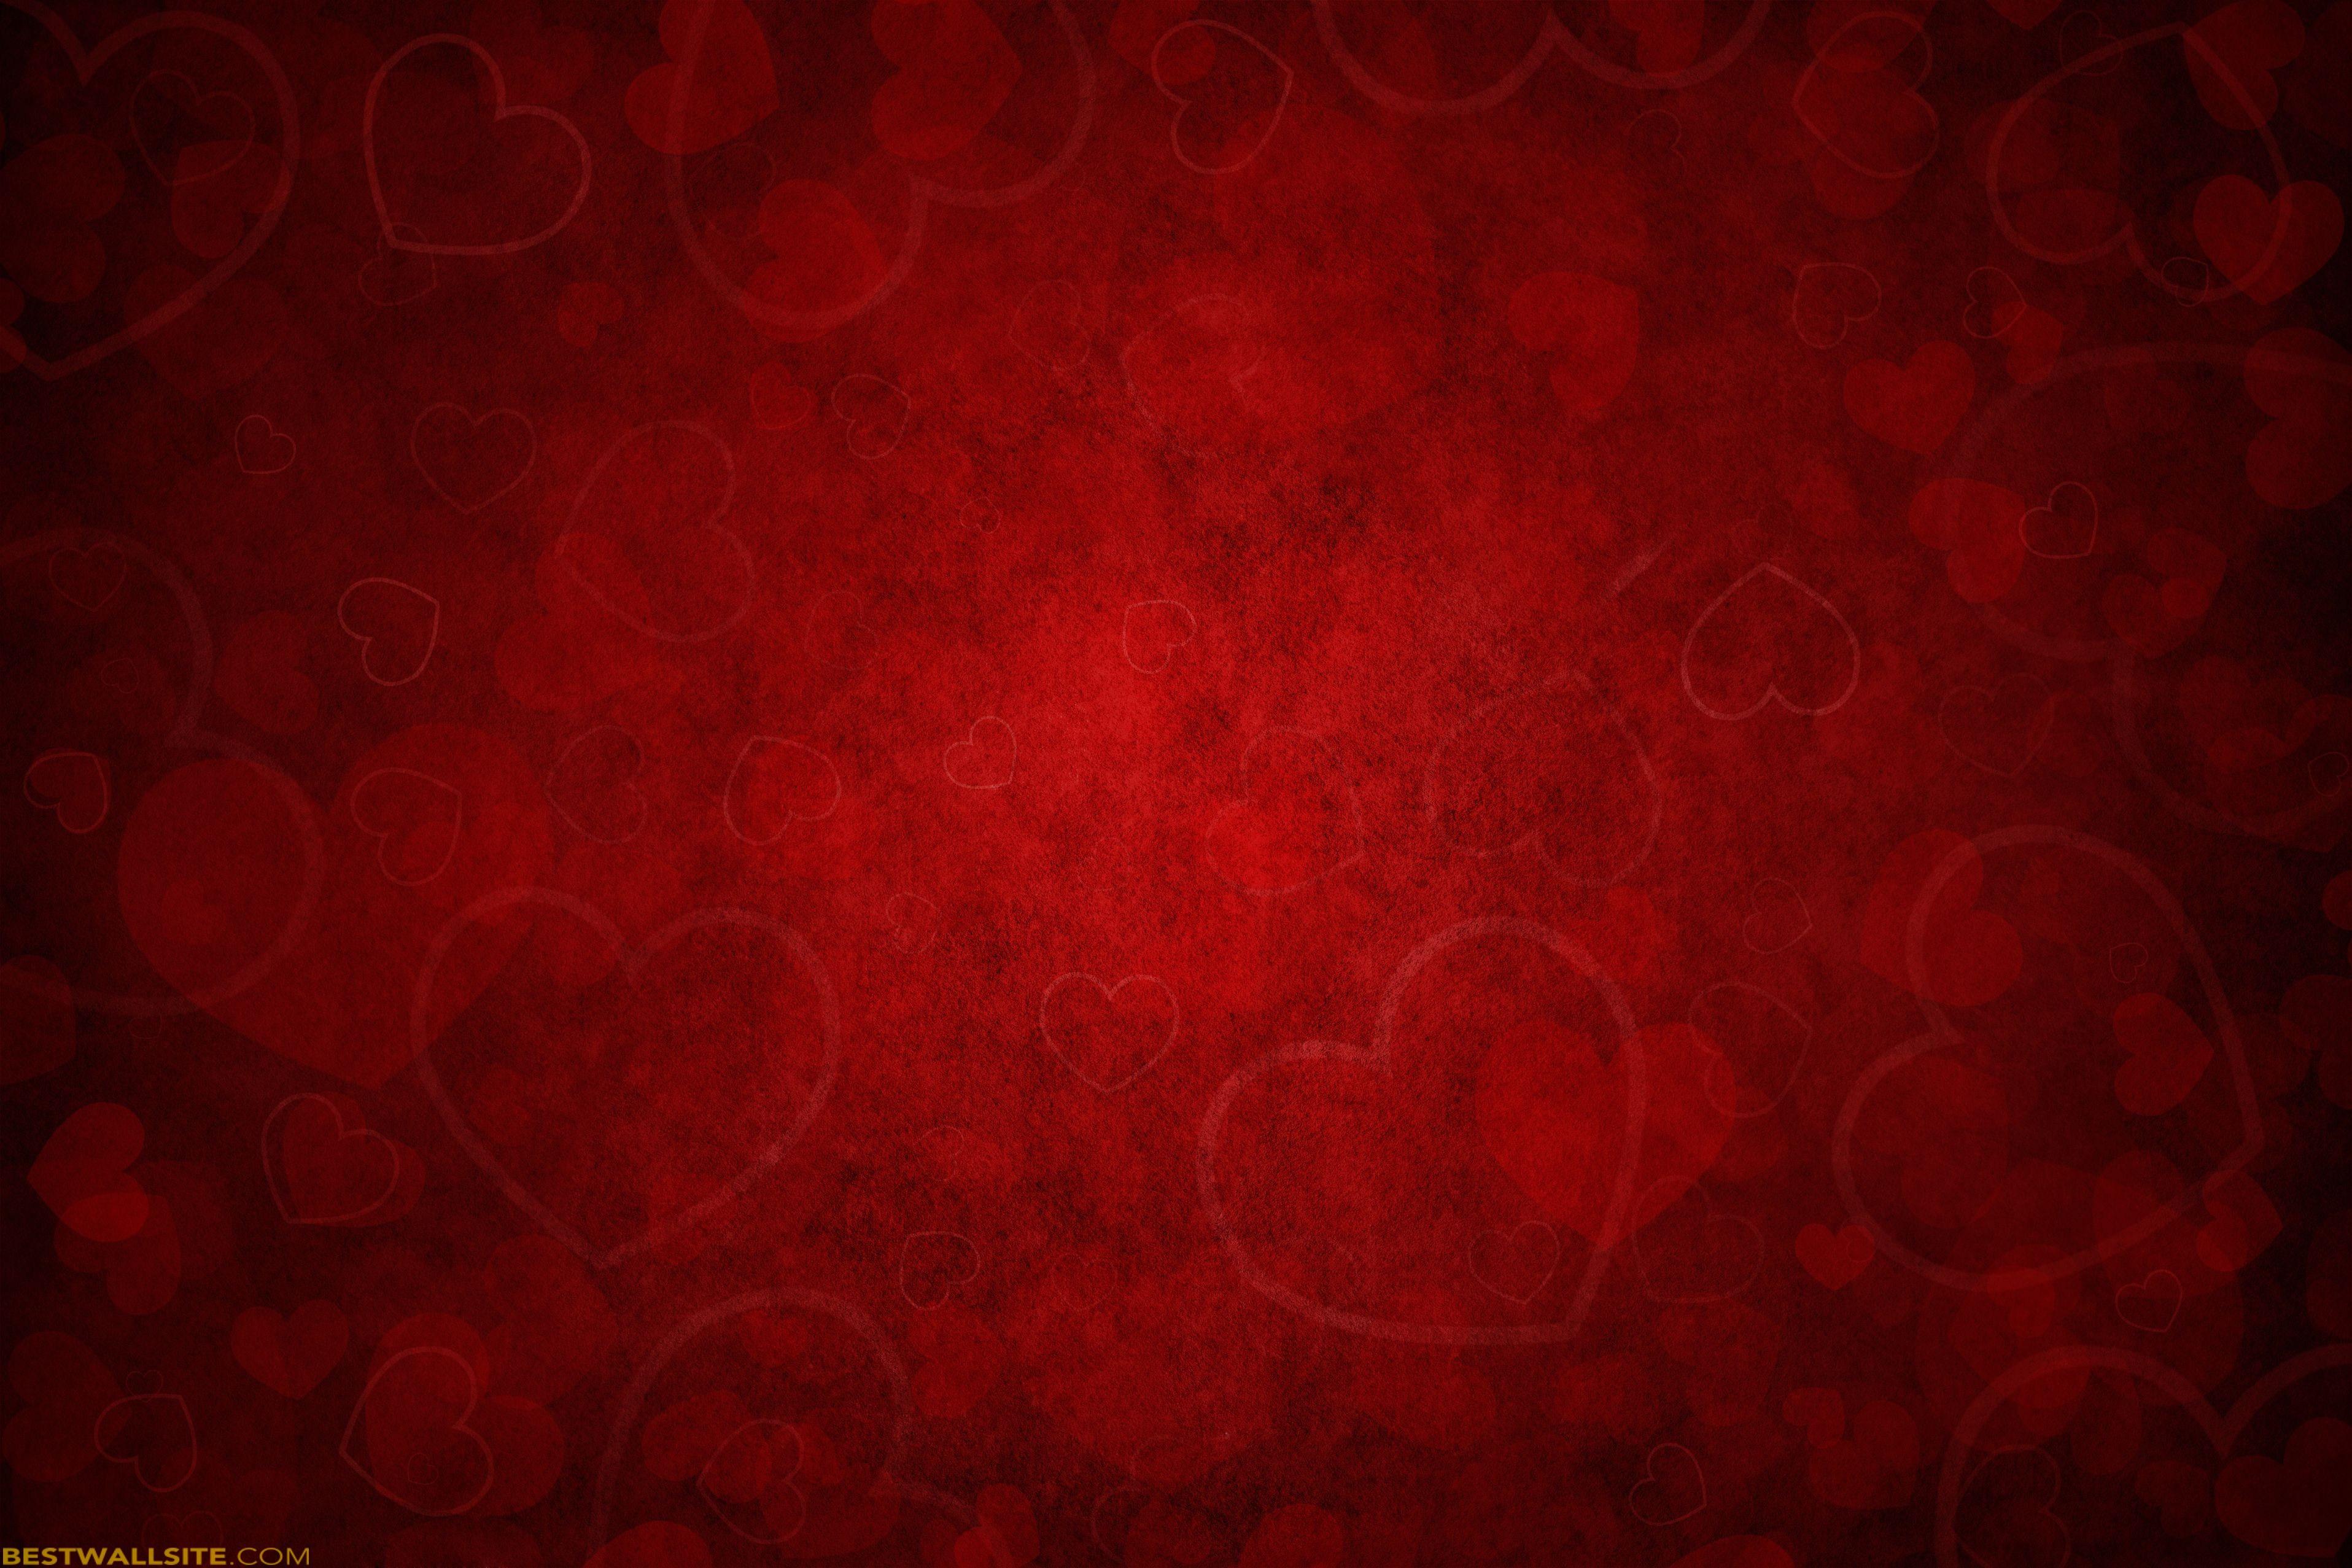 Blood Red Hearts Screensaver   BestWallSite.com